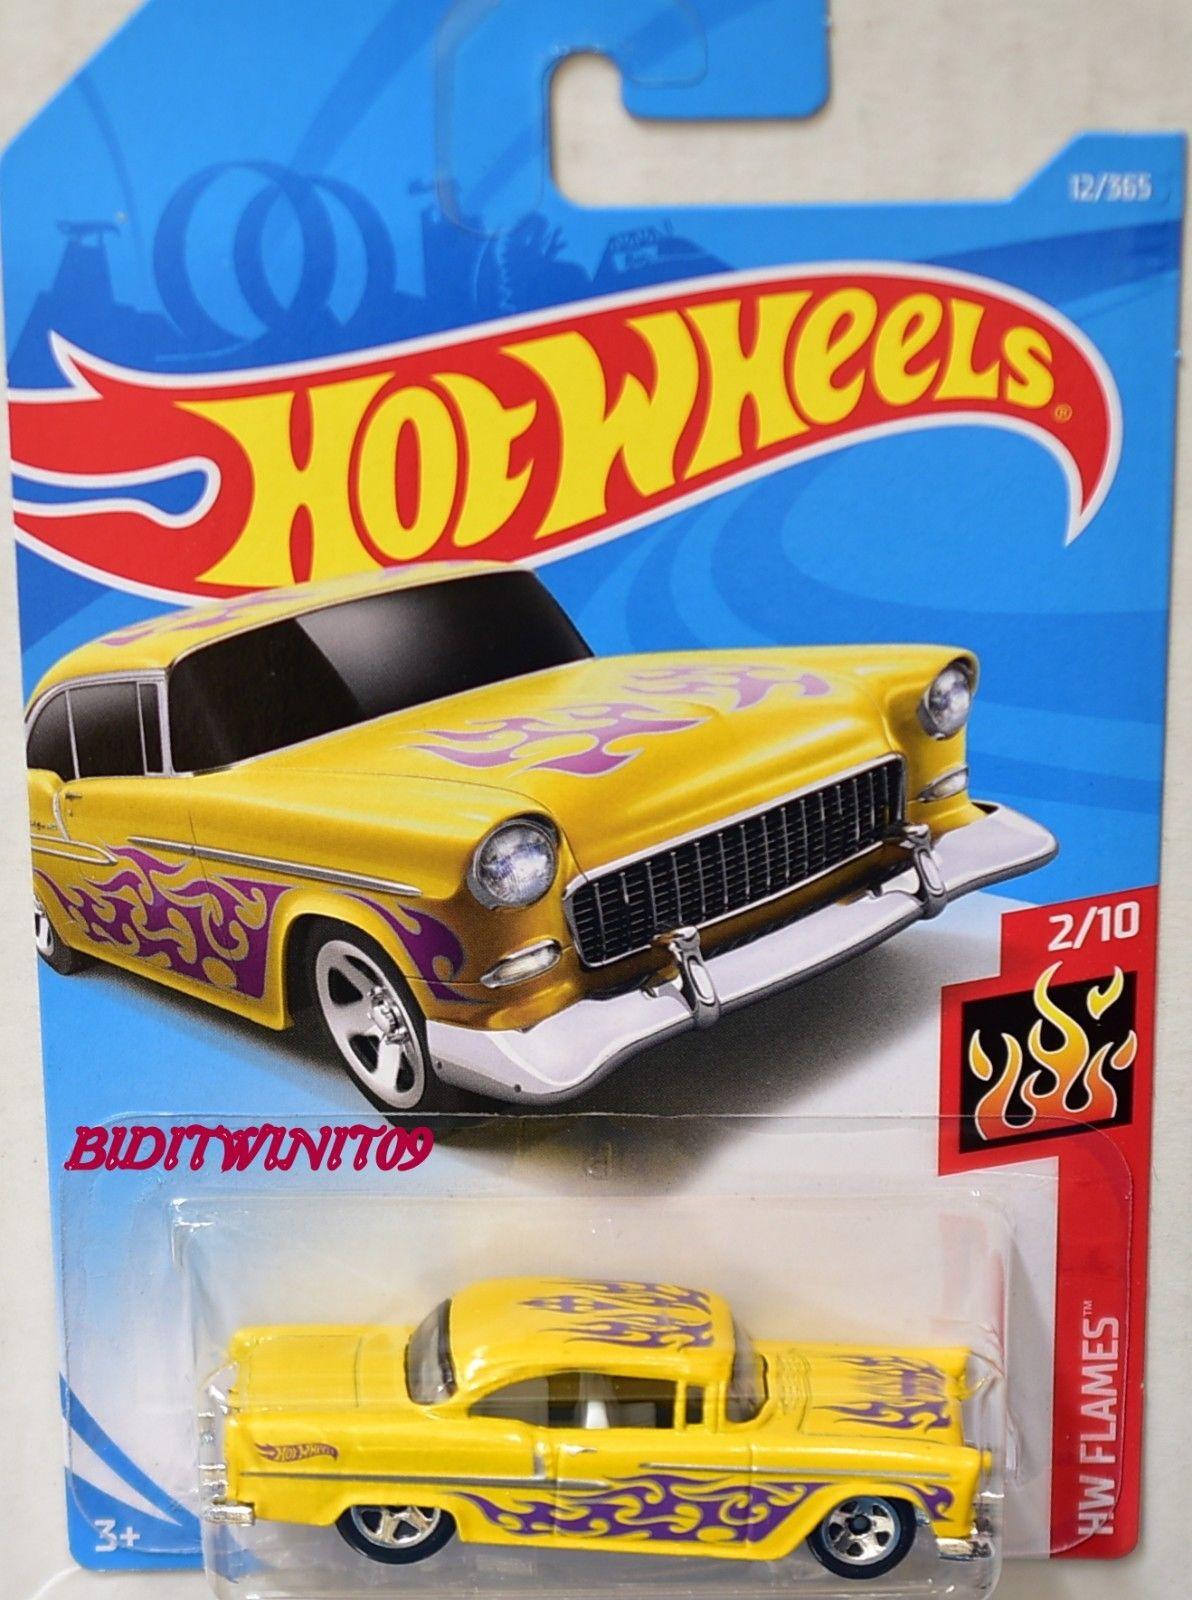 2 5 Hot Wheels 2018 Hw Flames 55 Chevy Yellow Ebay Collectibles Hot Wheels Hot Wheels Toys Mattel Hot Wheels [ 1600 x 1192 Pixel ]